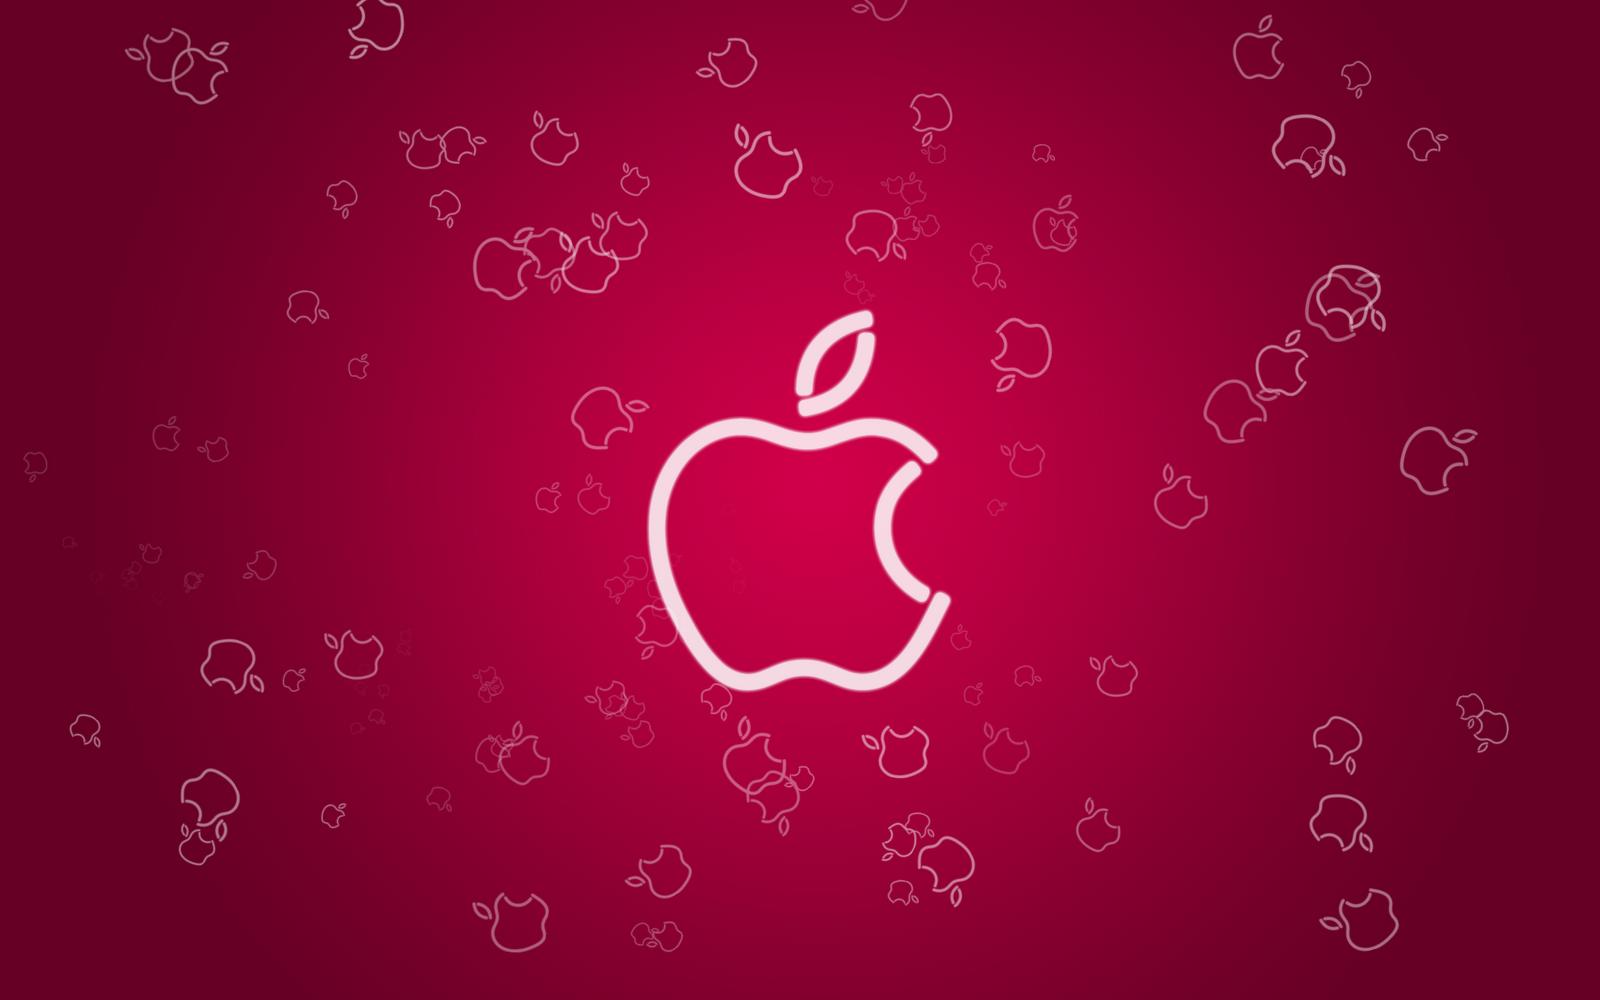 k ultra hd wallpapers apple images for desktop free download | hd